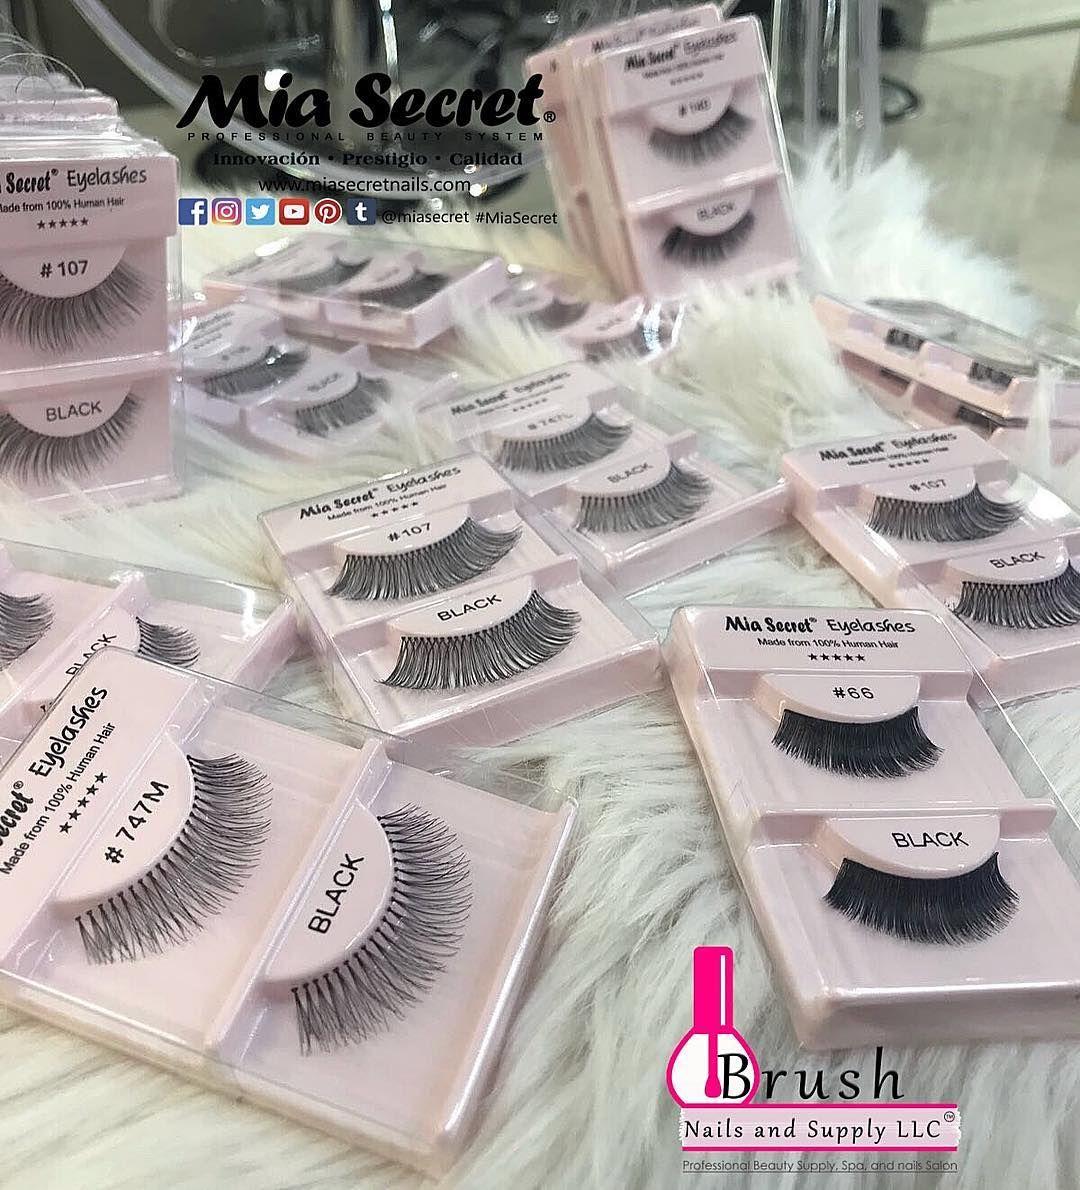 If You Want The Best Mia Secret Has It Eyelashes Miasecret